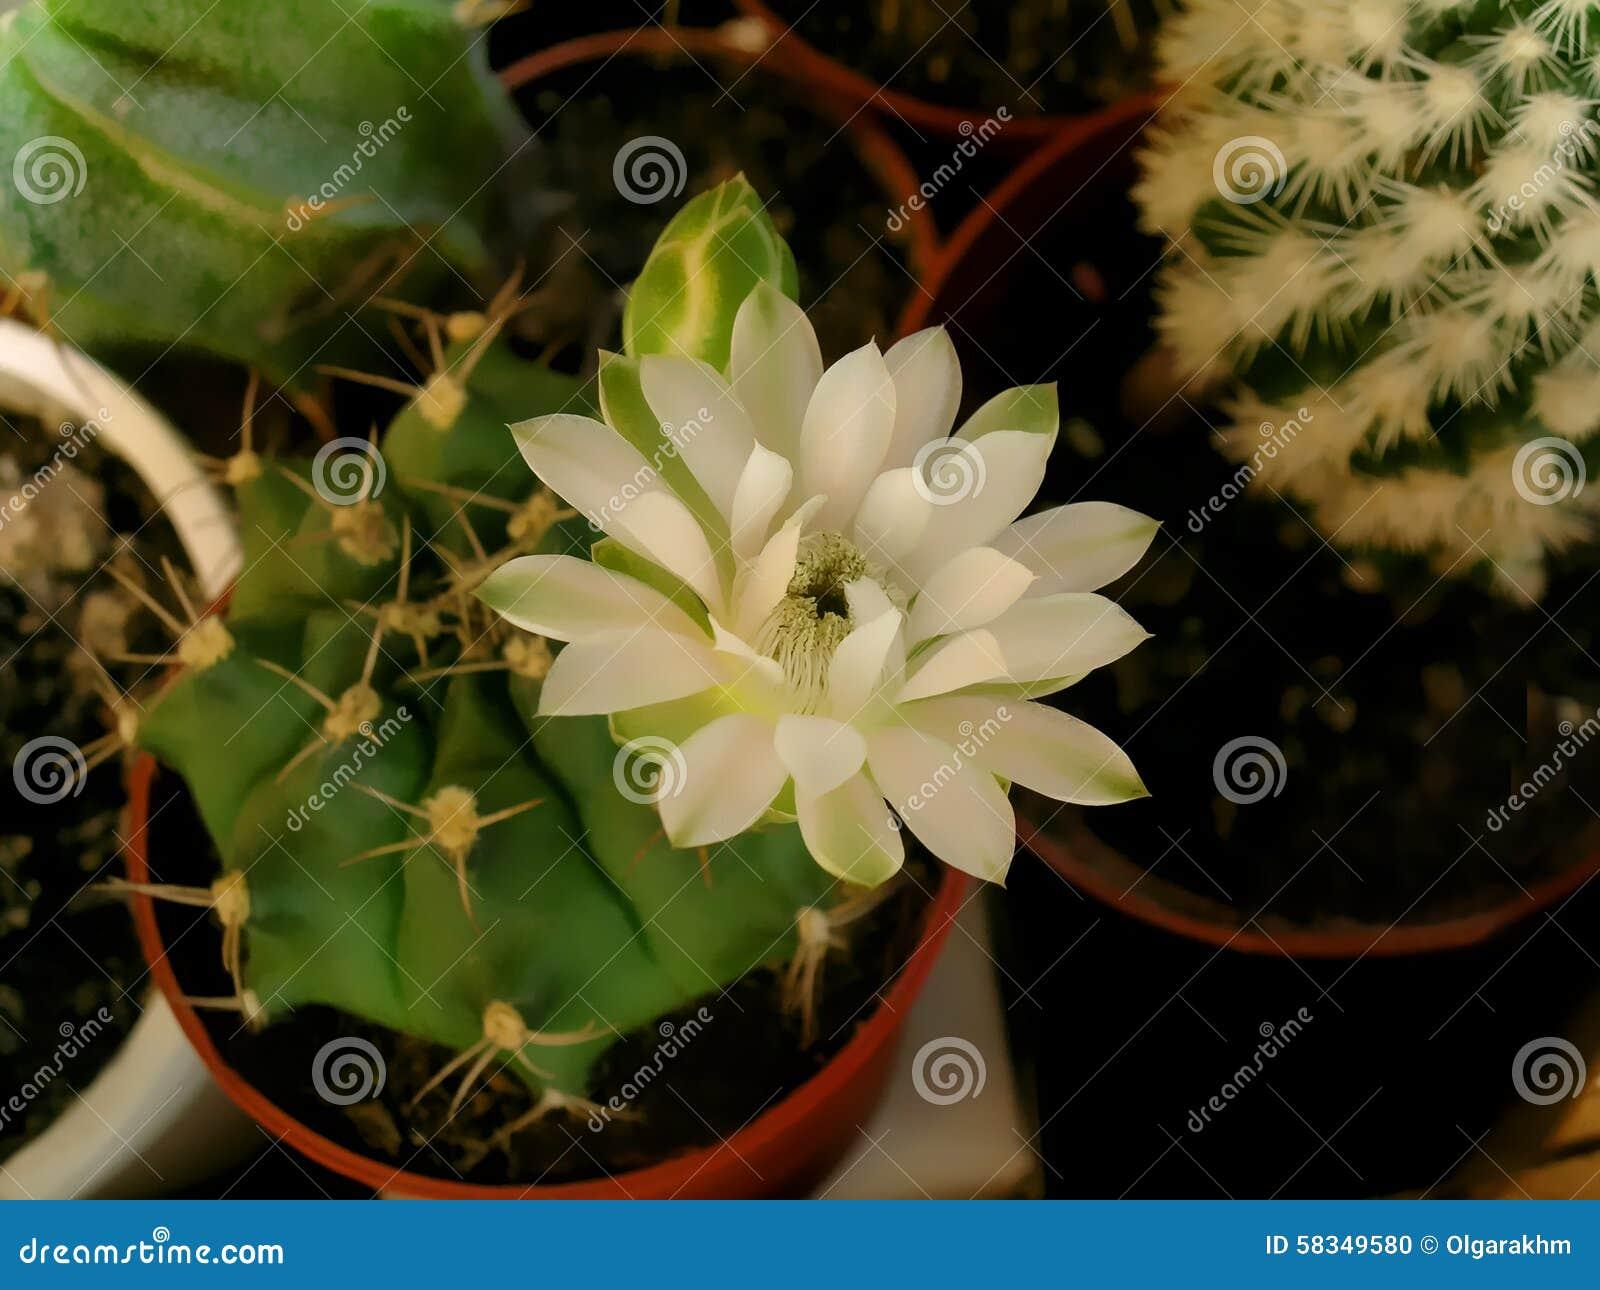 Gymnocalicium cactus flower stock photo image of floral brown gymnocalicium cactus flower mightylinksfo